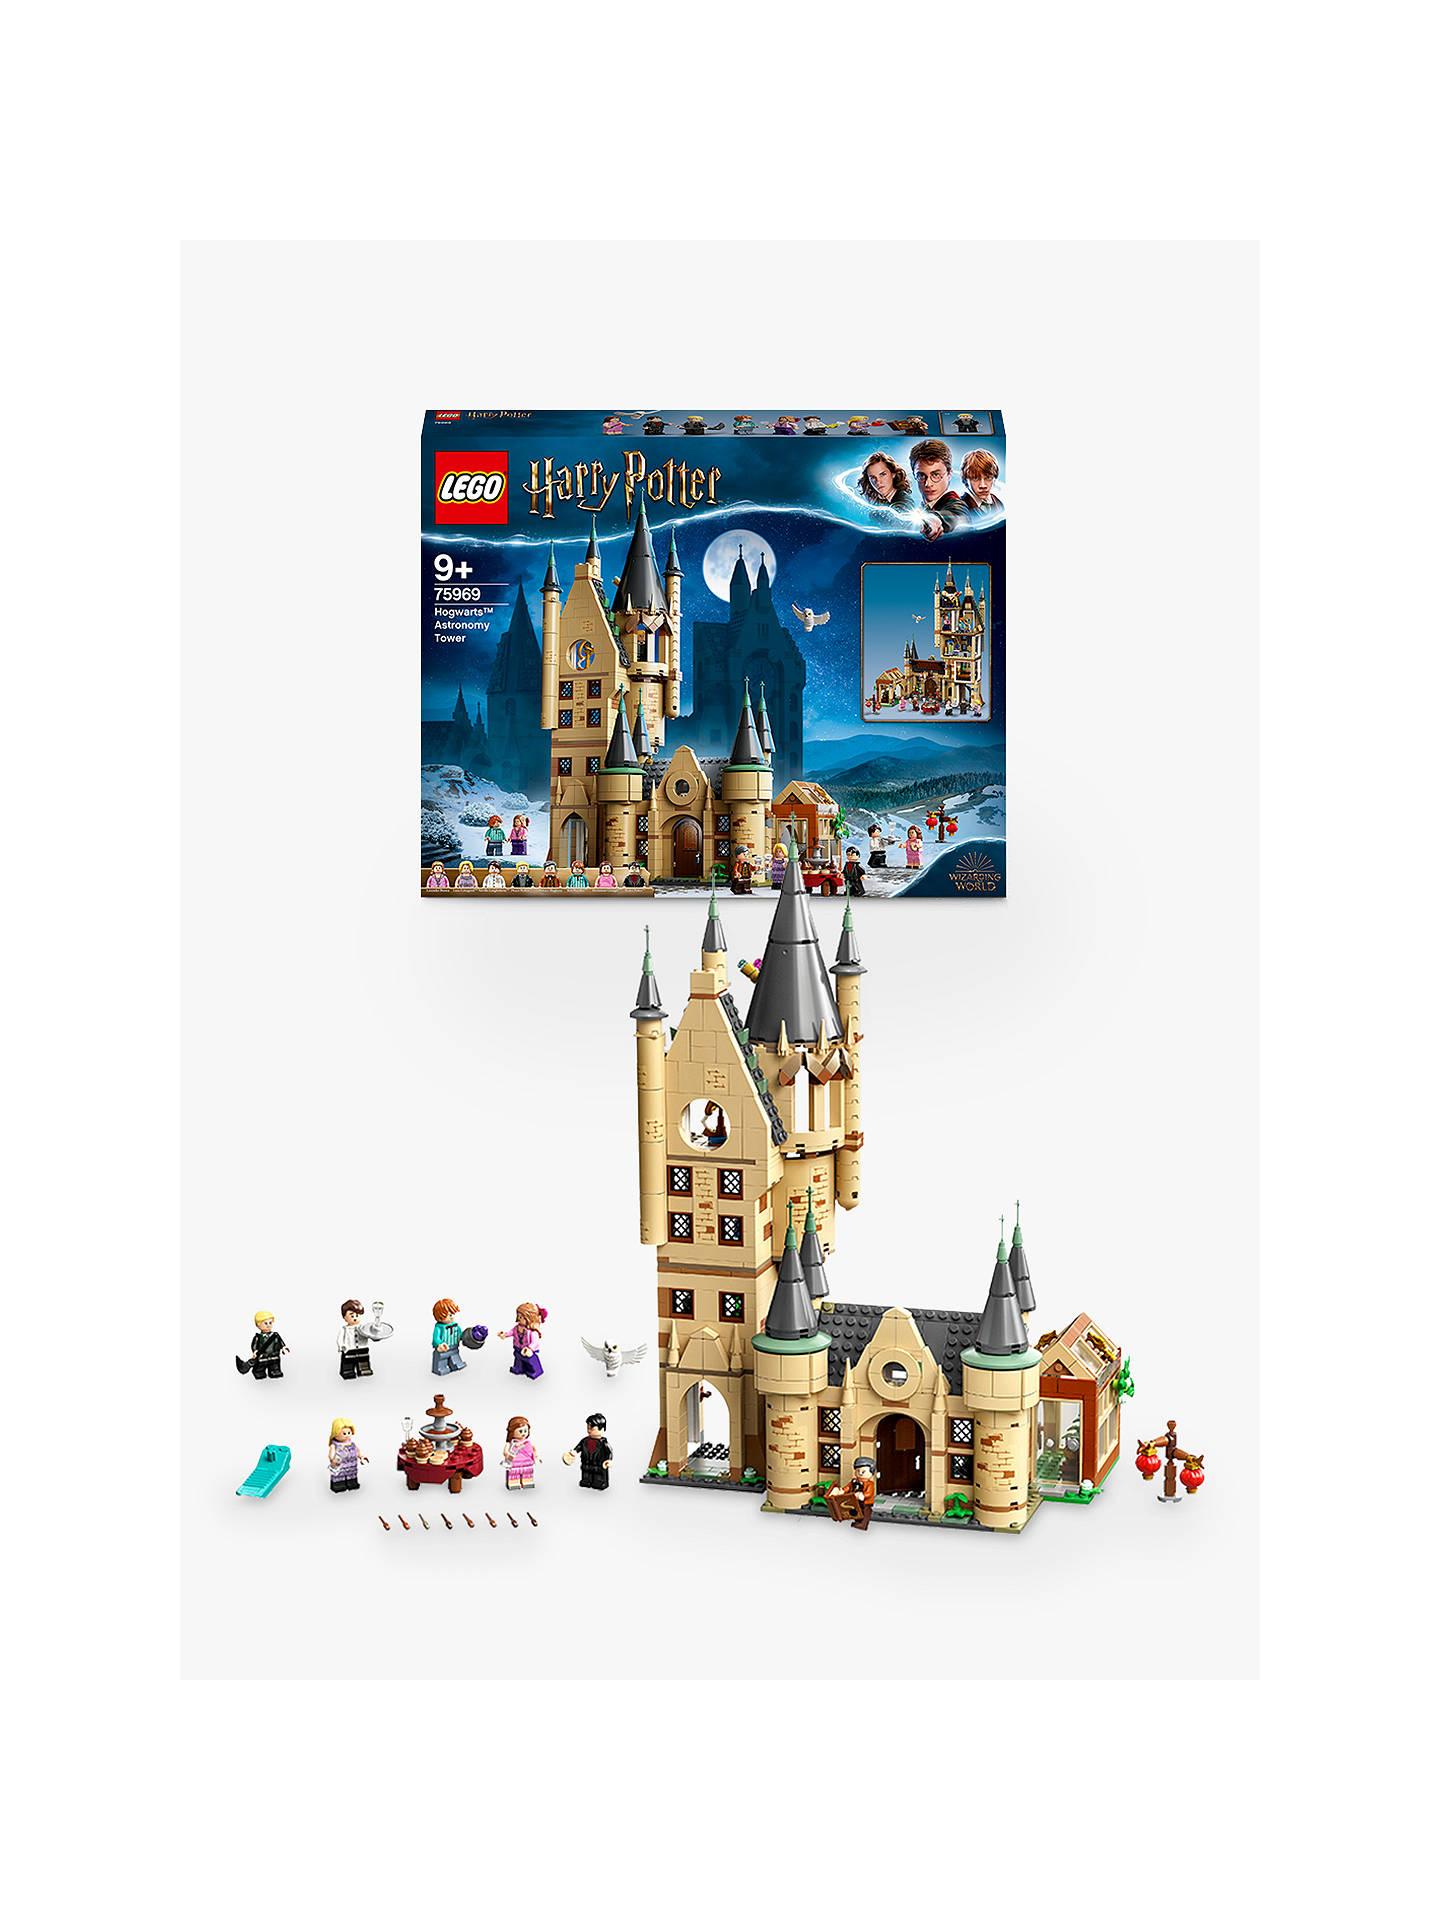 LEGO Harry Potter 75968 Privet Drive at John Lewis & Partners